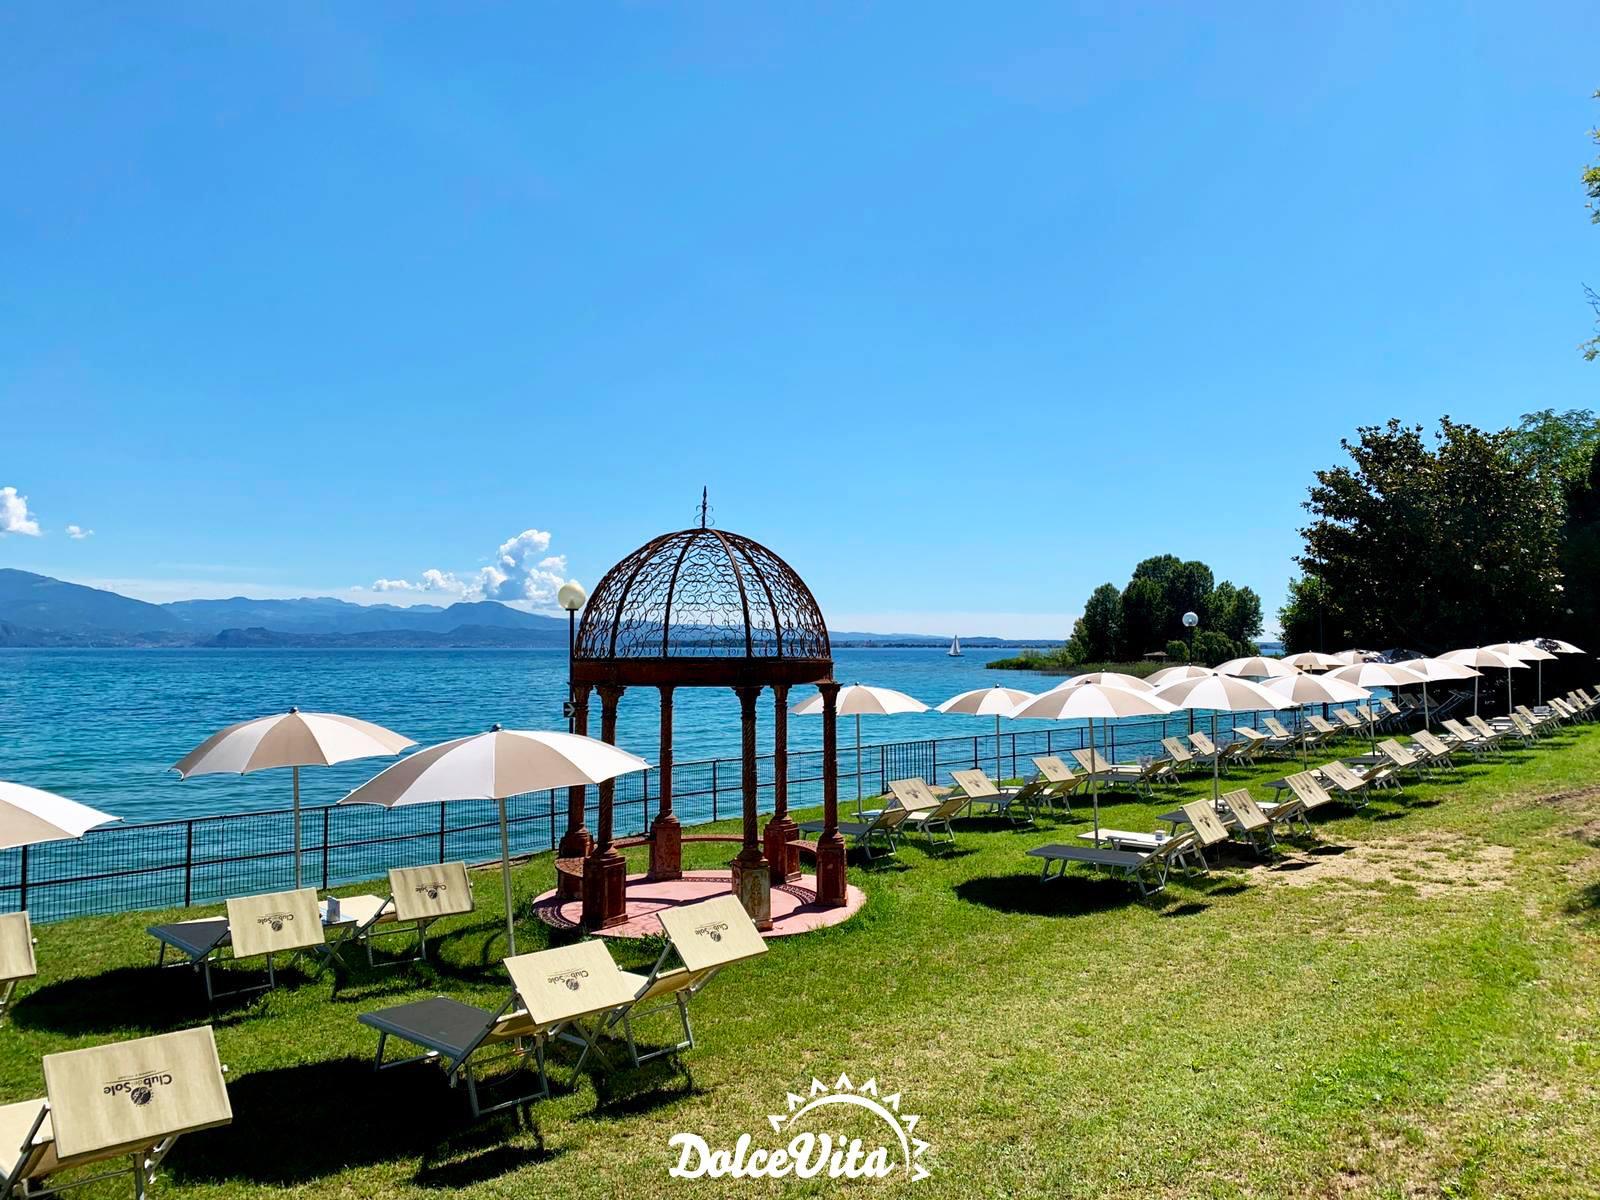 Dolcevita Beach Restaurant & Bar